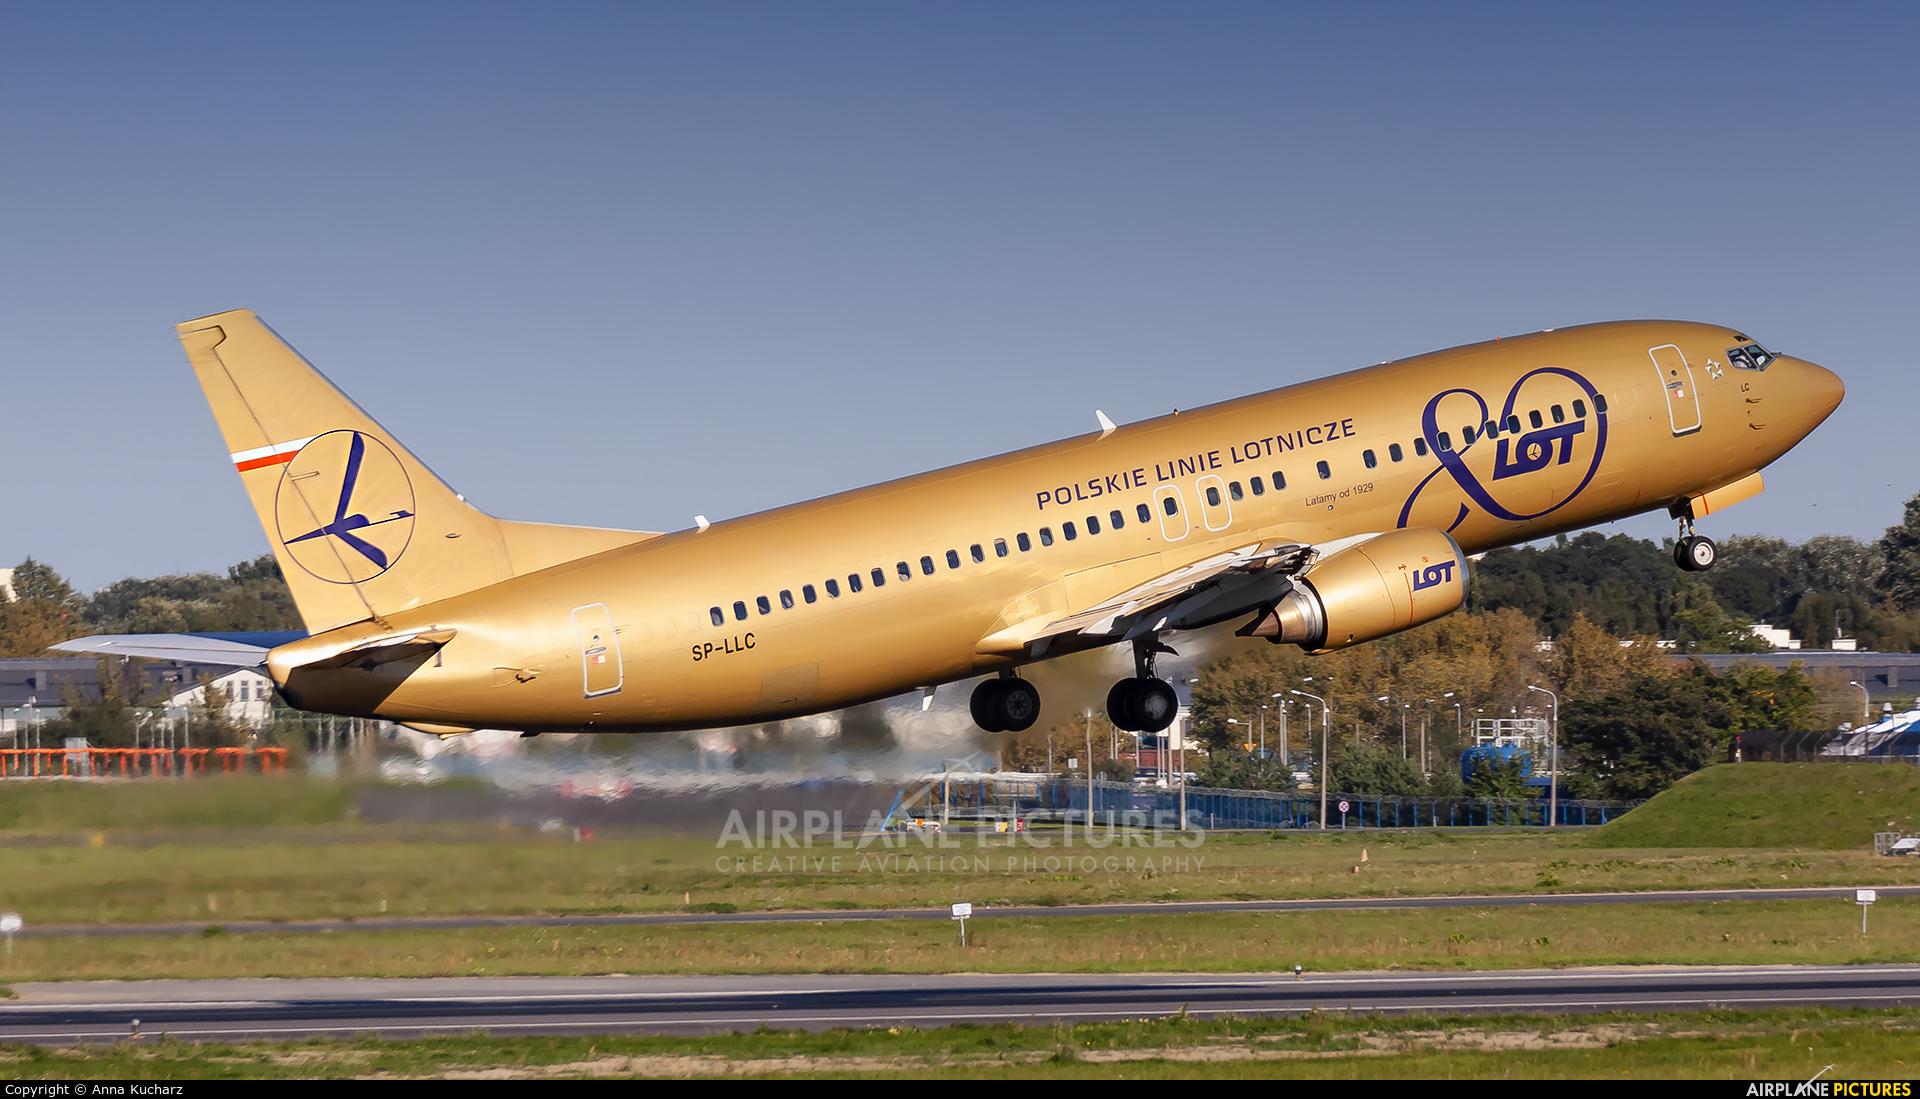 LOT - Polish Airlines SP-LLC aircraft at Warsaw - Frederic Chopin